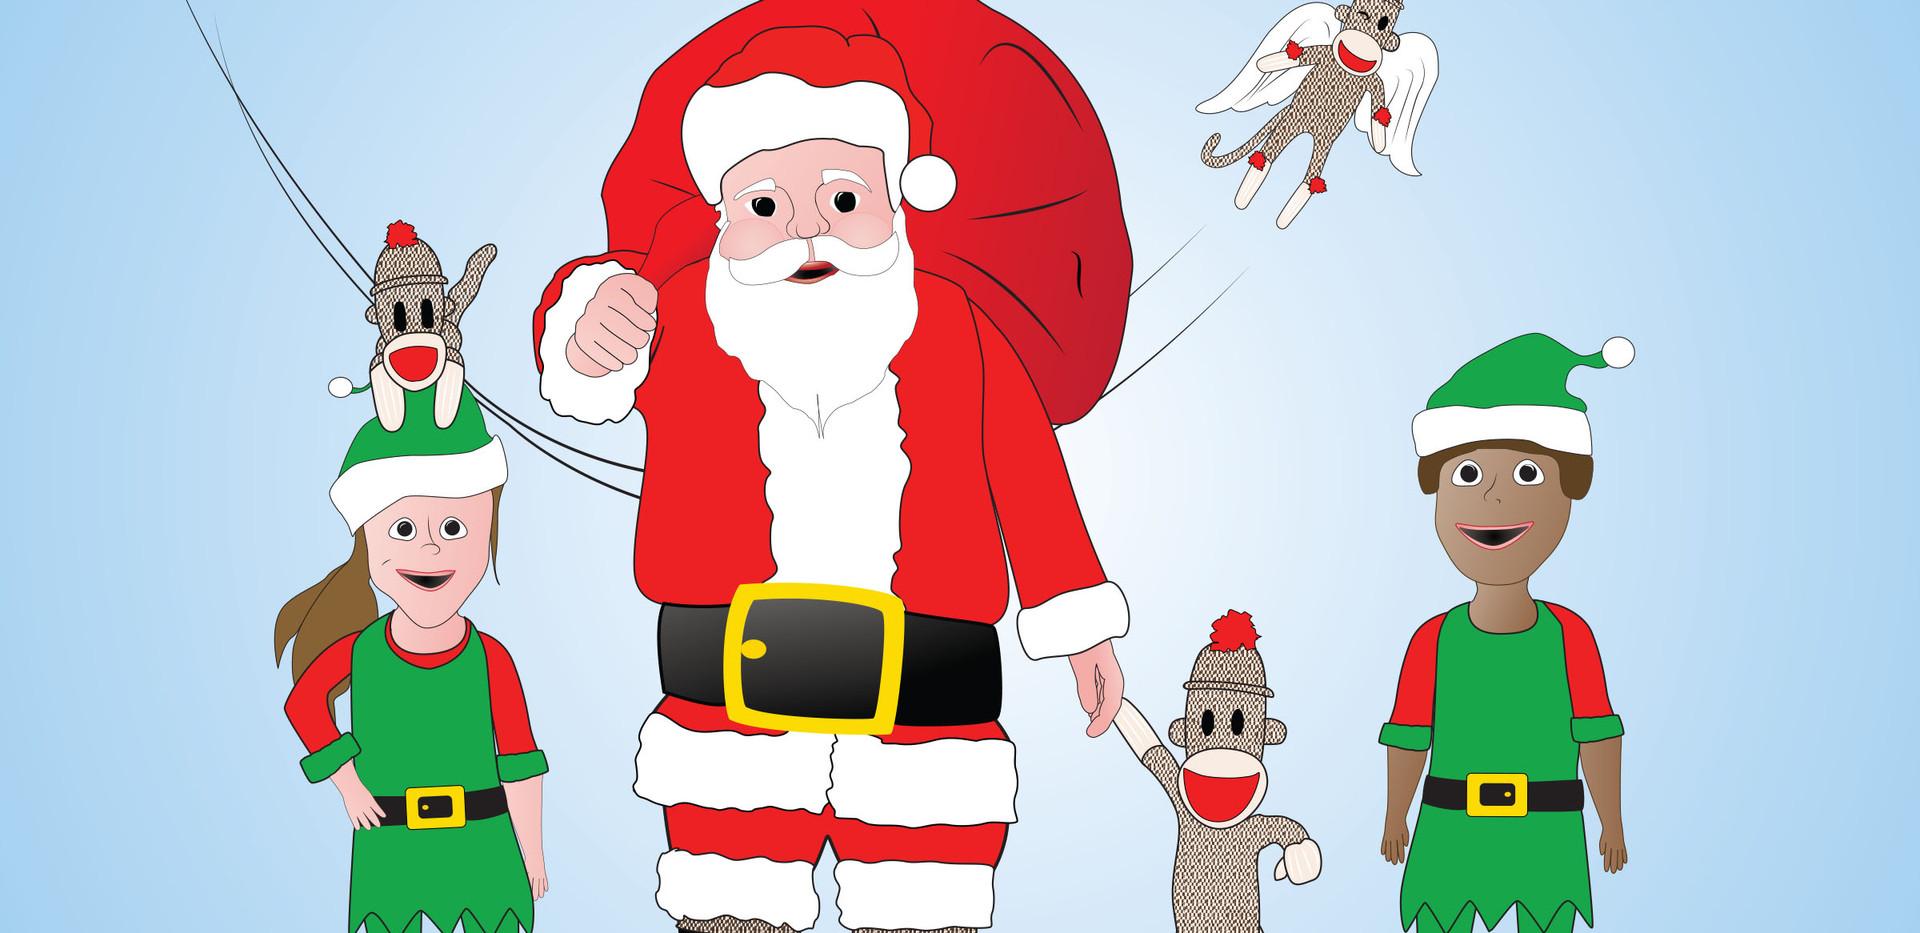 Santa and his friends